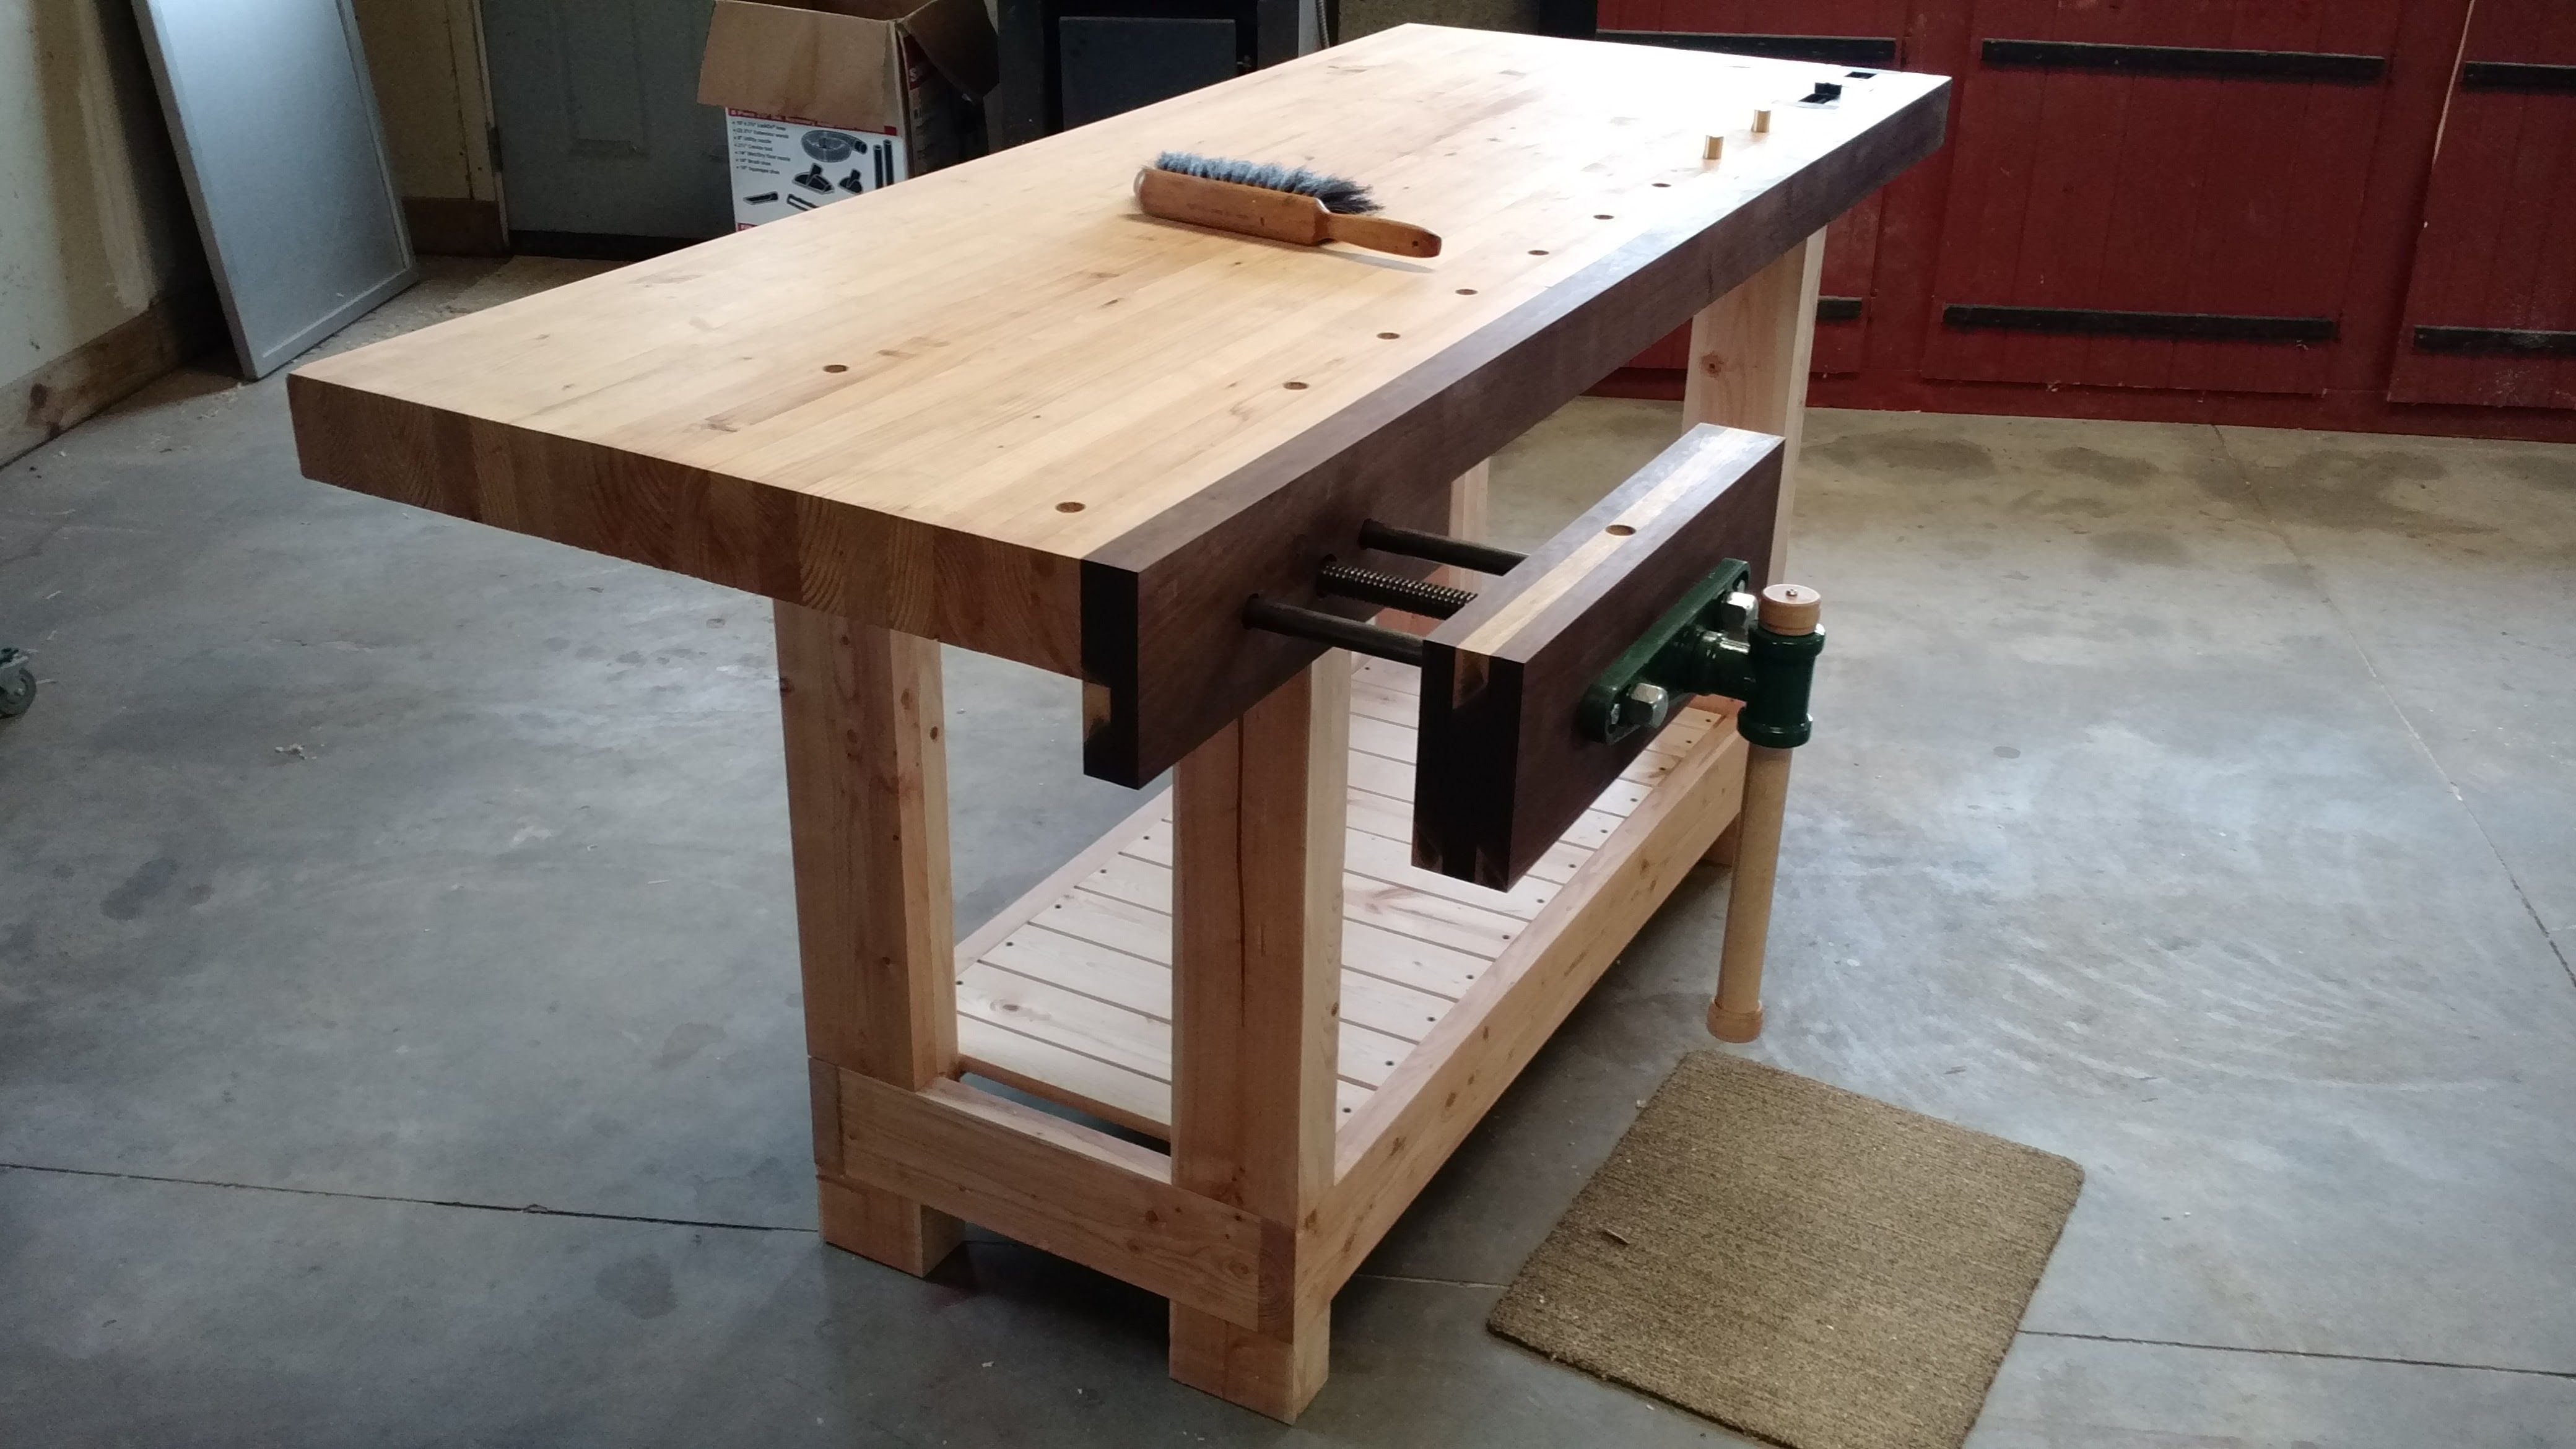 Simple Workbench Front Vise Sliding End Vise Dog Holes With